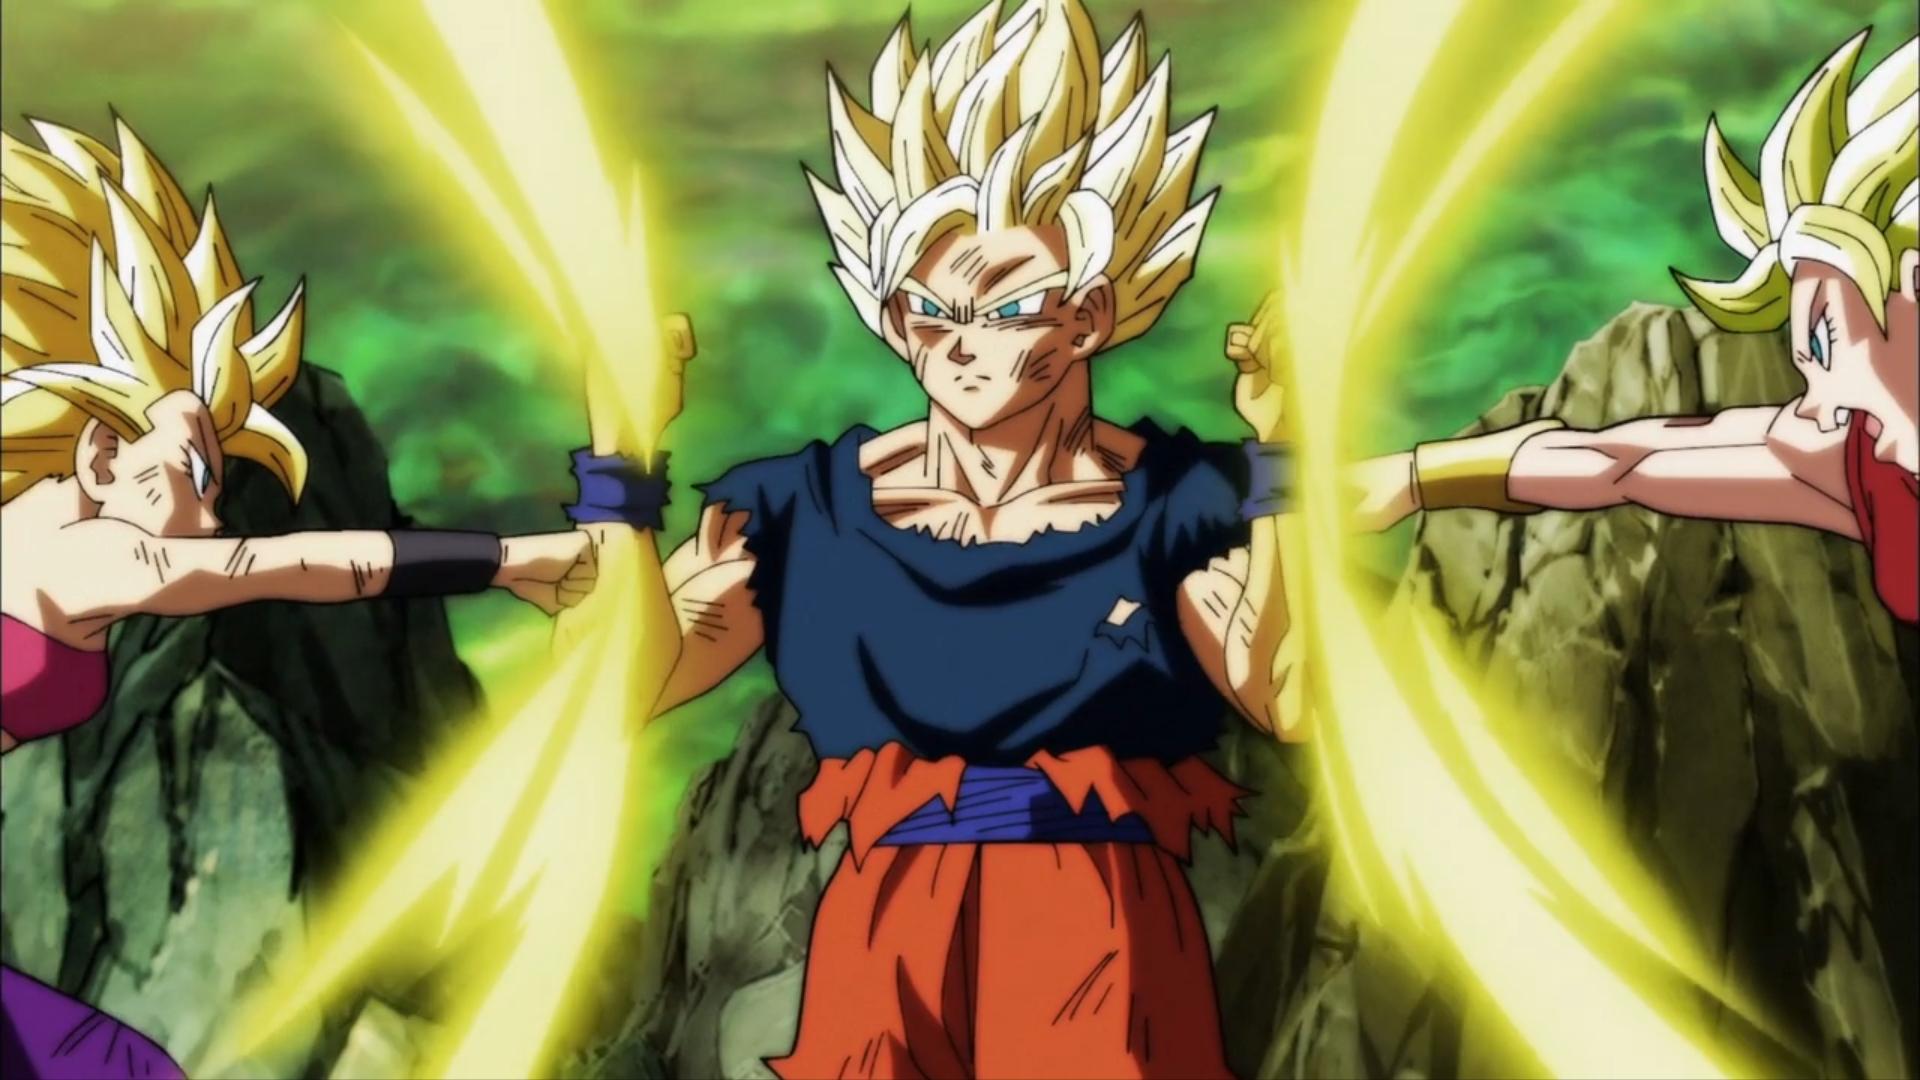 Son Goku Vs Caulifla And Kale Hd Wallpaper Background Image